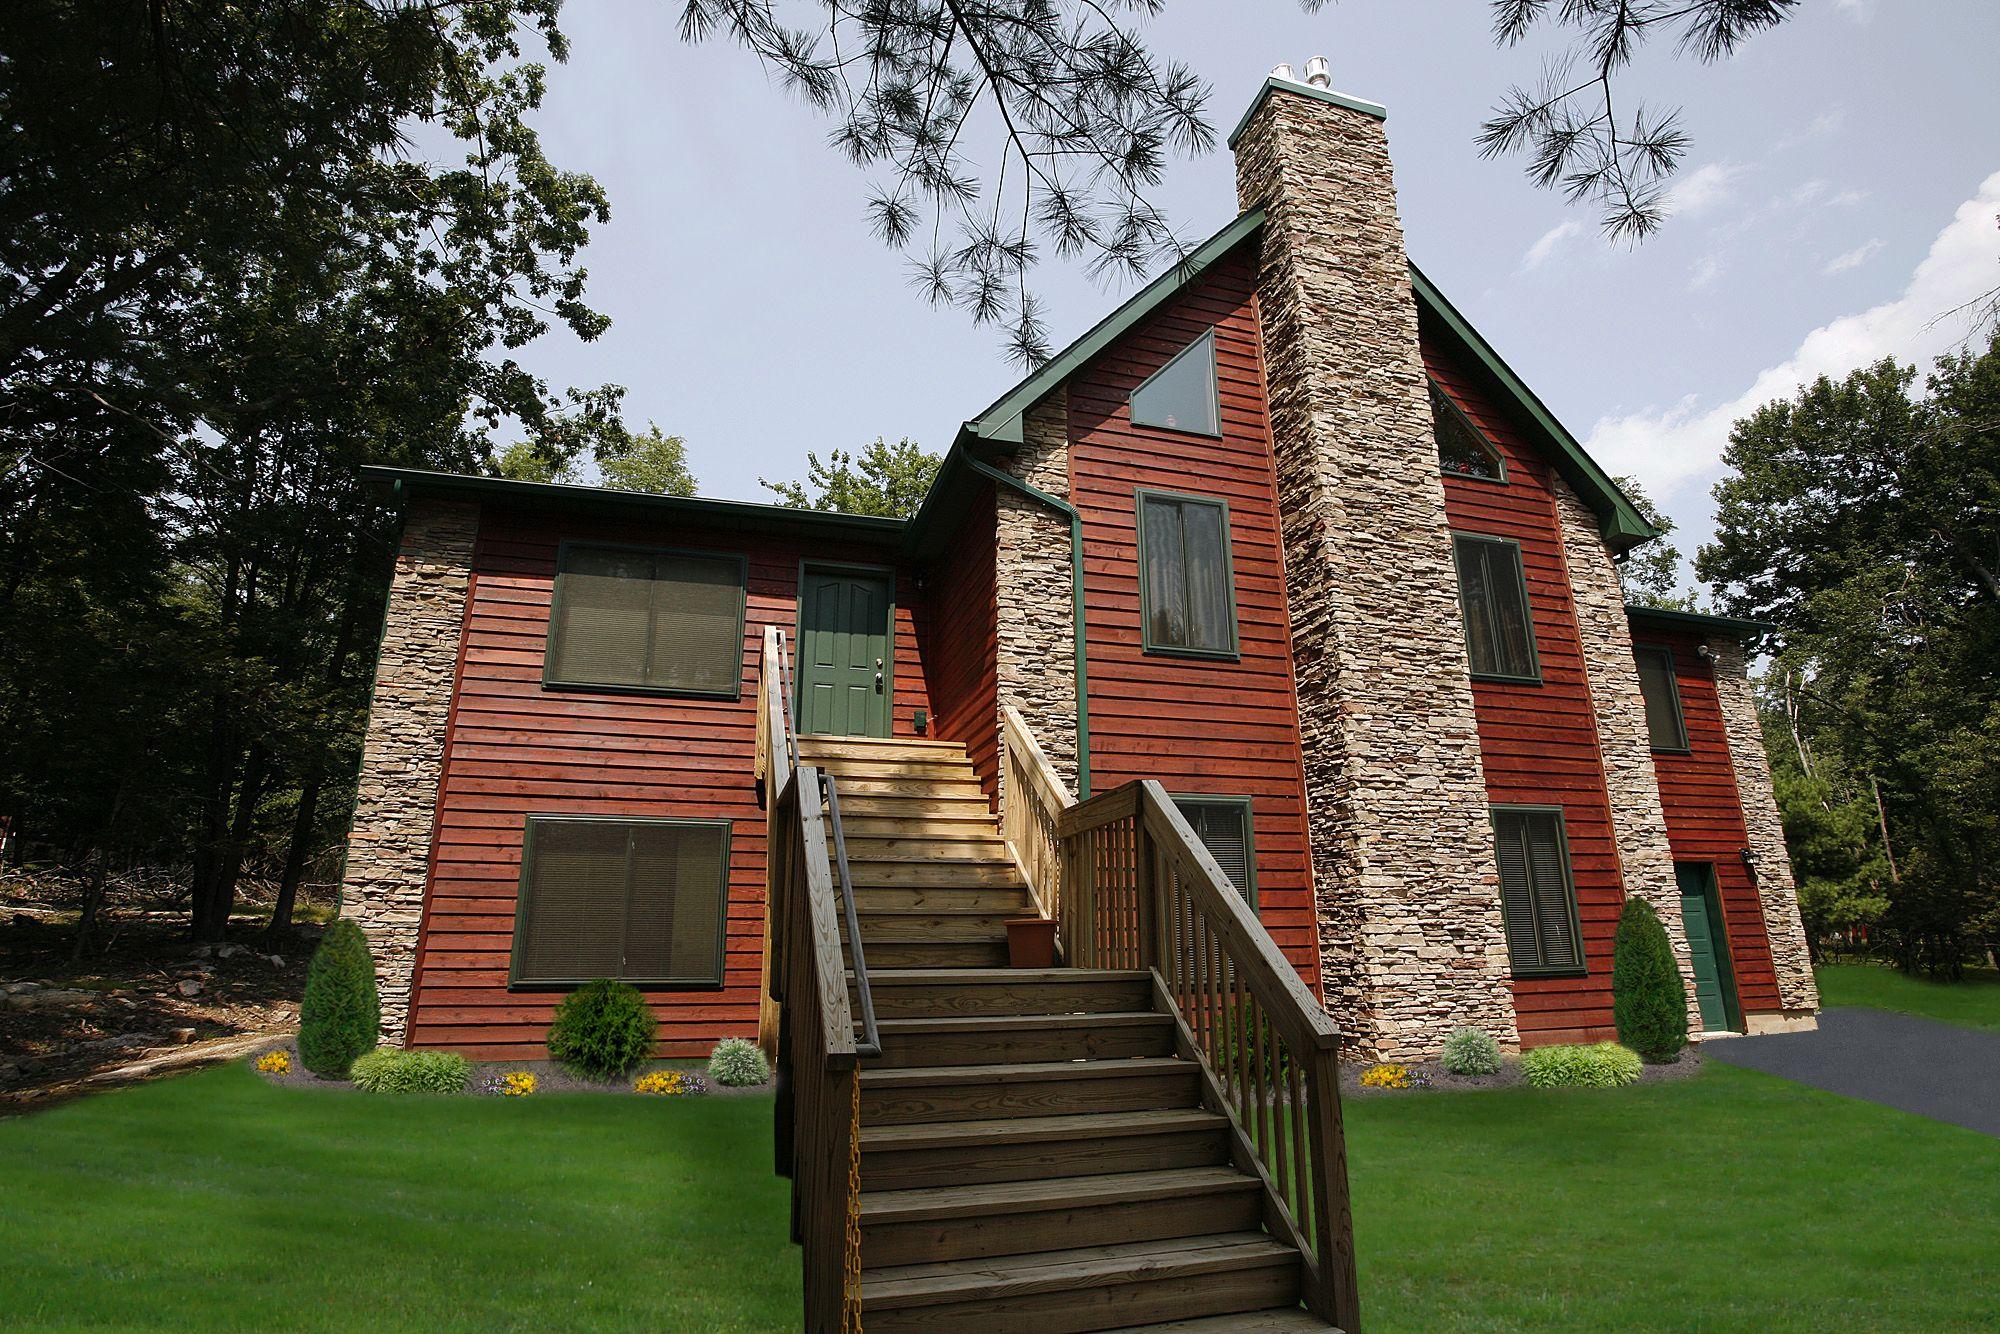 listings sale cabins condos to exterior poconomtns stay places streamside magnolia find cottages browse and poconos rental pocono a cabin our condo resort for